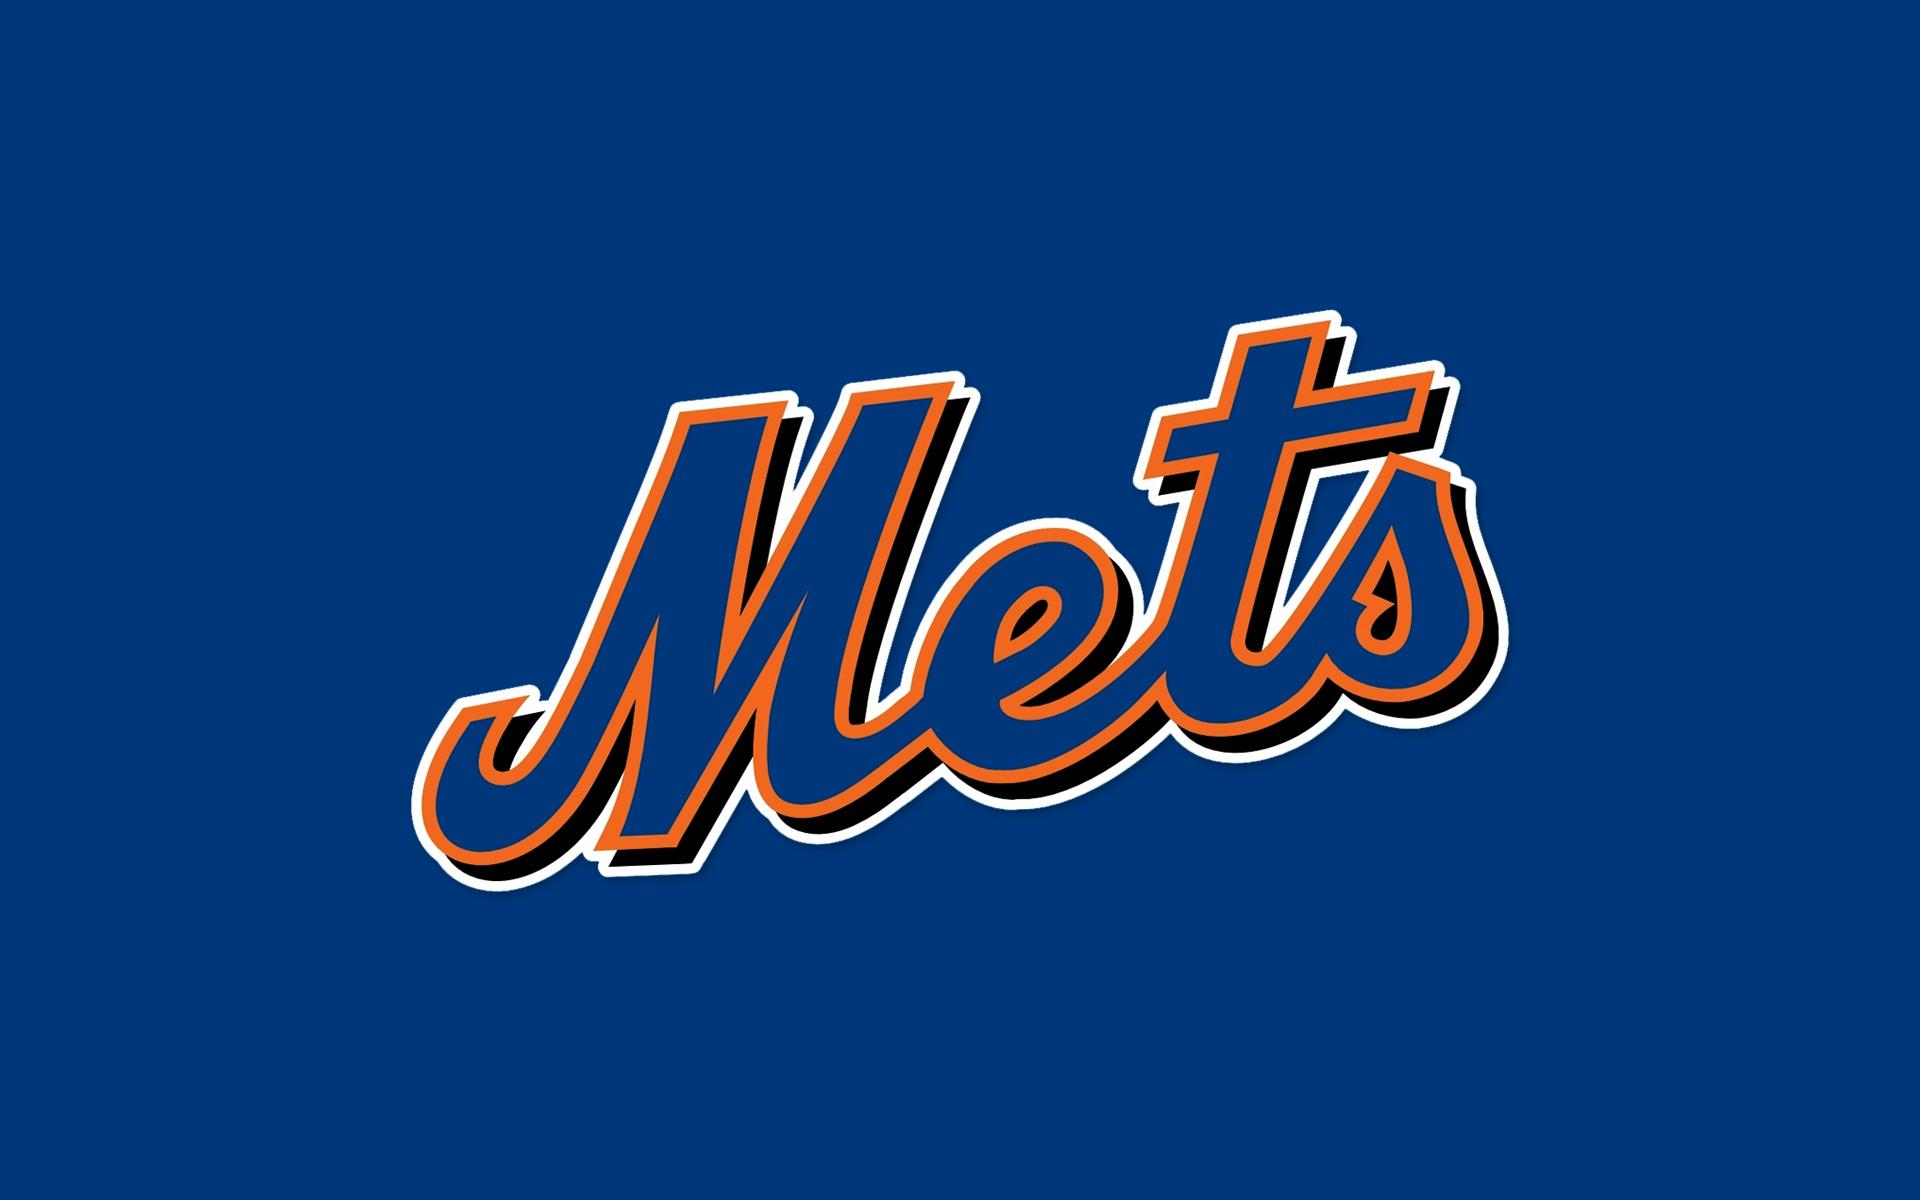 new york mets logo wallpaper 50286